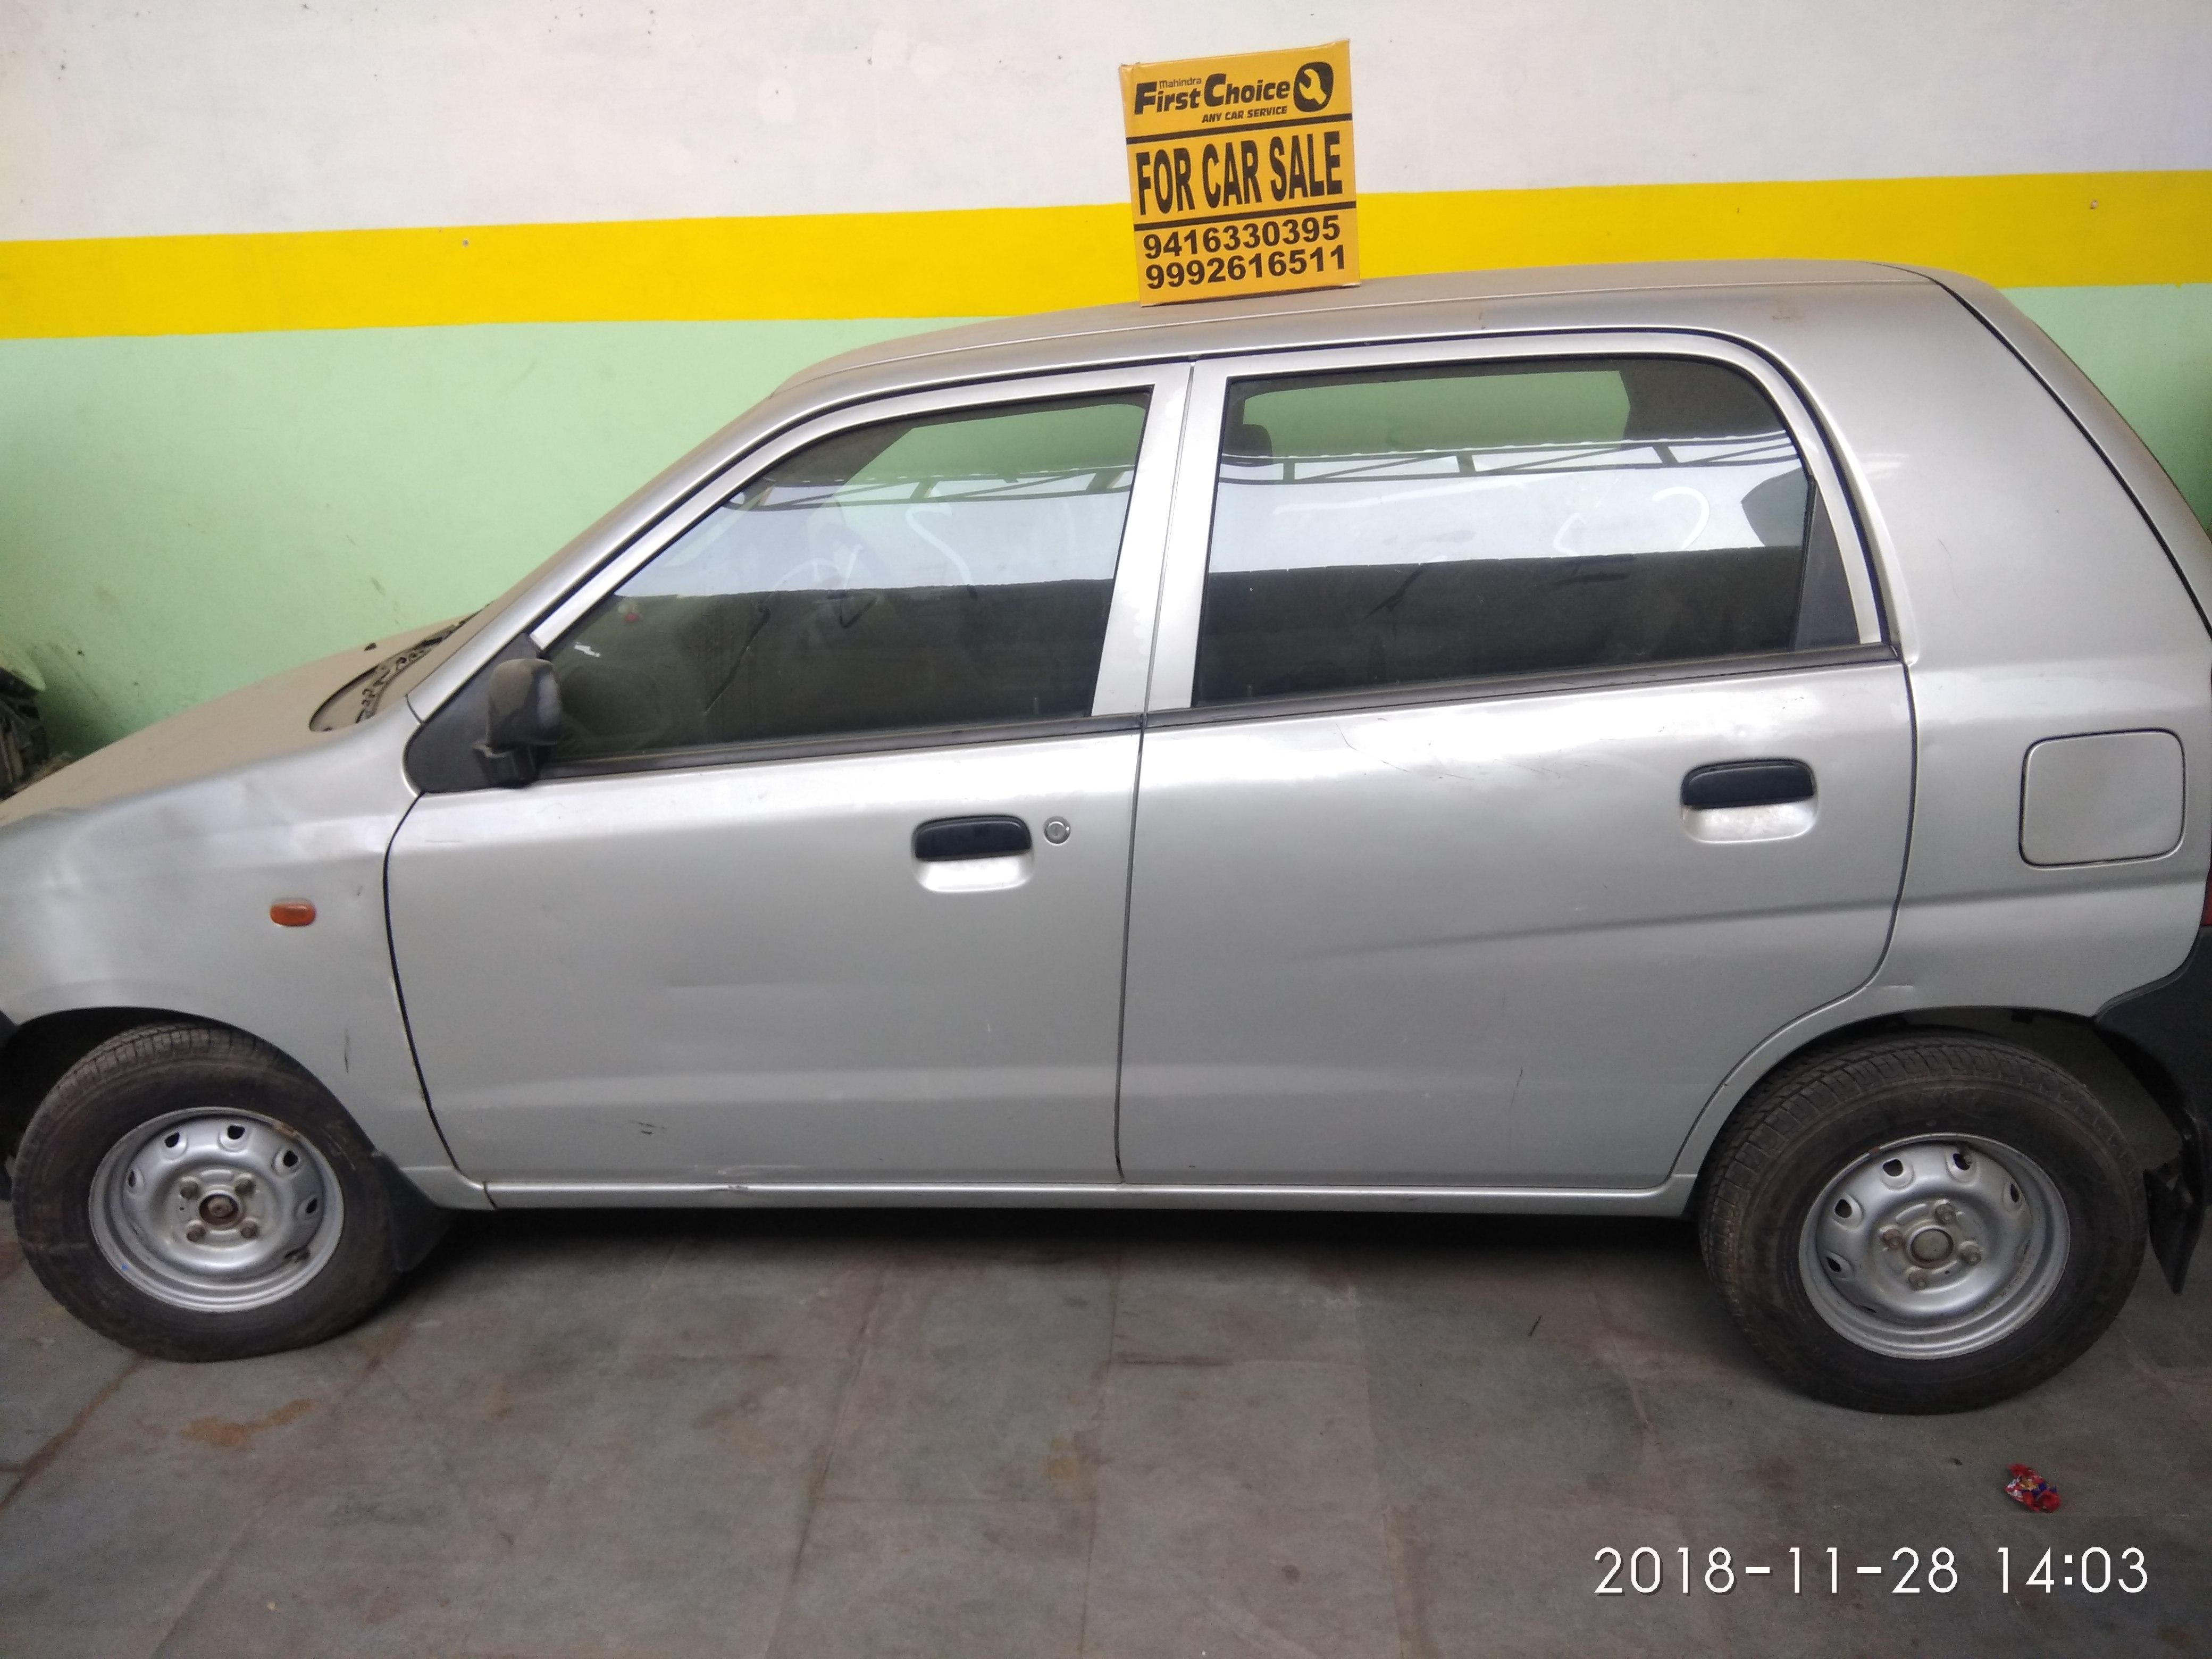 32cdaf18eb32b8 Maruti Suzuki Alto Lxi Bs Iii - Mahindra First Choice